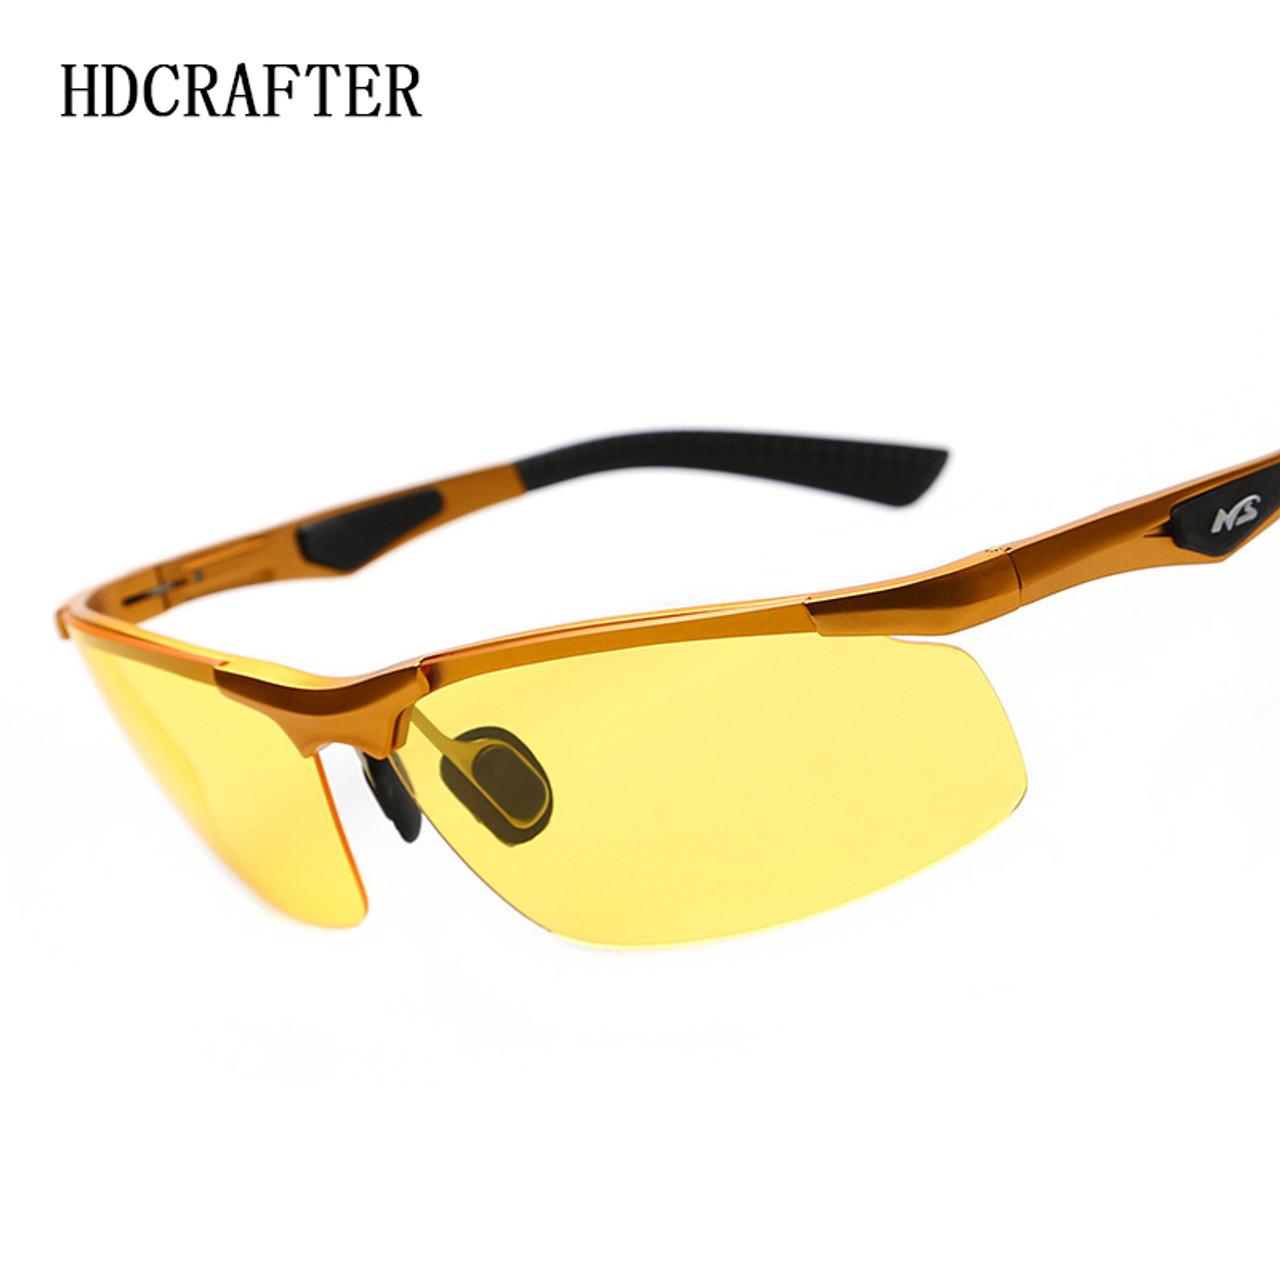 4dc6aa2661fa ... Night Driving New HDCRAFTER Anti-Glare Goggles Eyeglasses Polarized  Driving Sunglasses Yellow Lens Night Vision ...